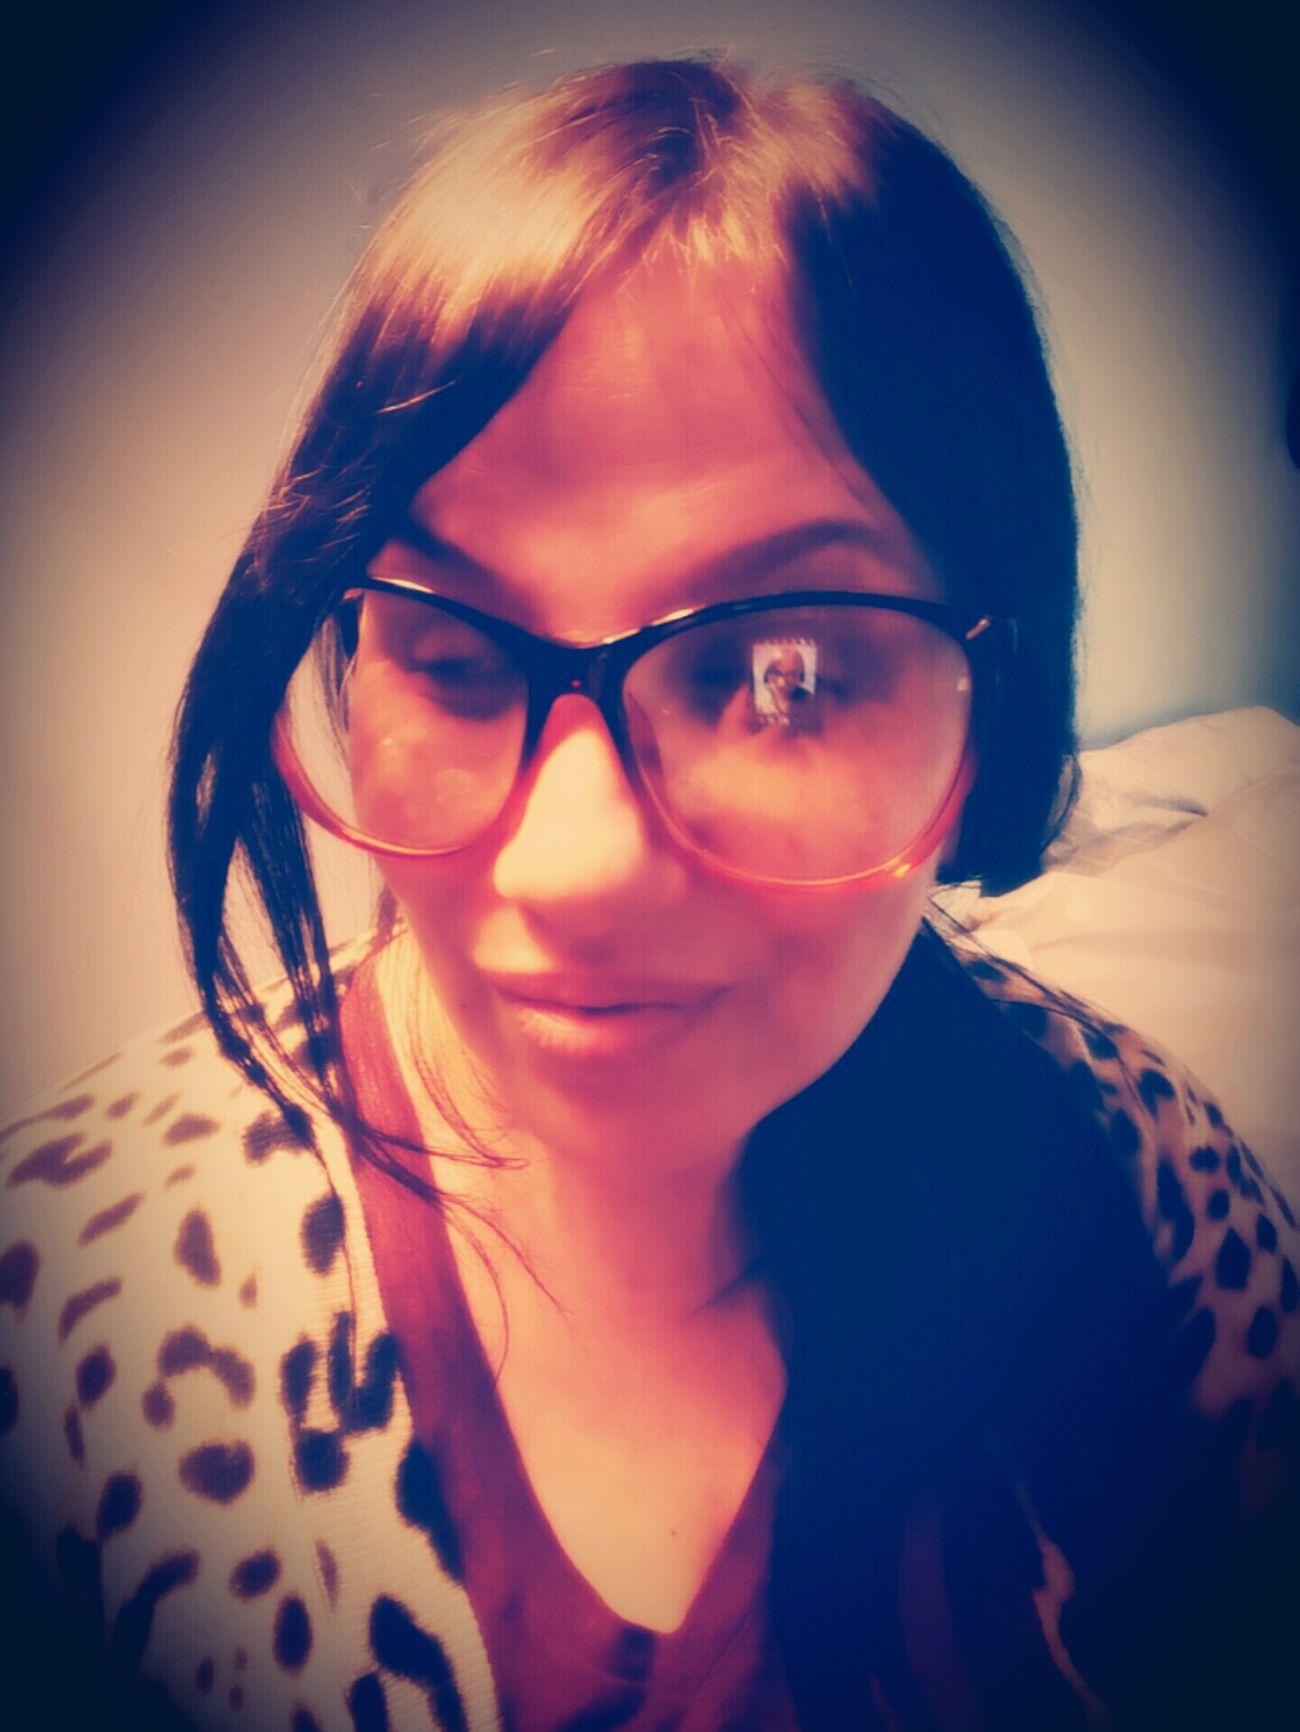 Taking Photos Self Self Portrait Selfie ✌ Self Portrait Around The World Me Glasses :) Glasses👌 Moi Cheetah Print Edited Selfie ♥ Womenofeyem